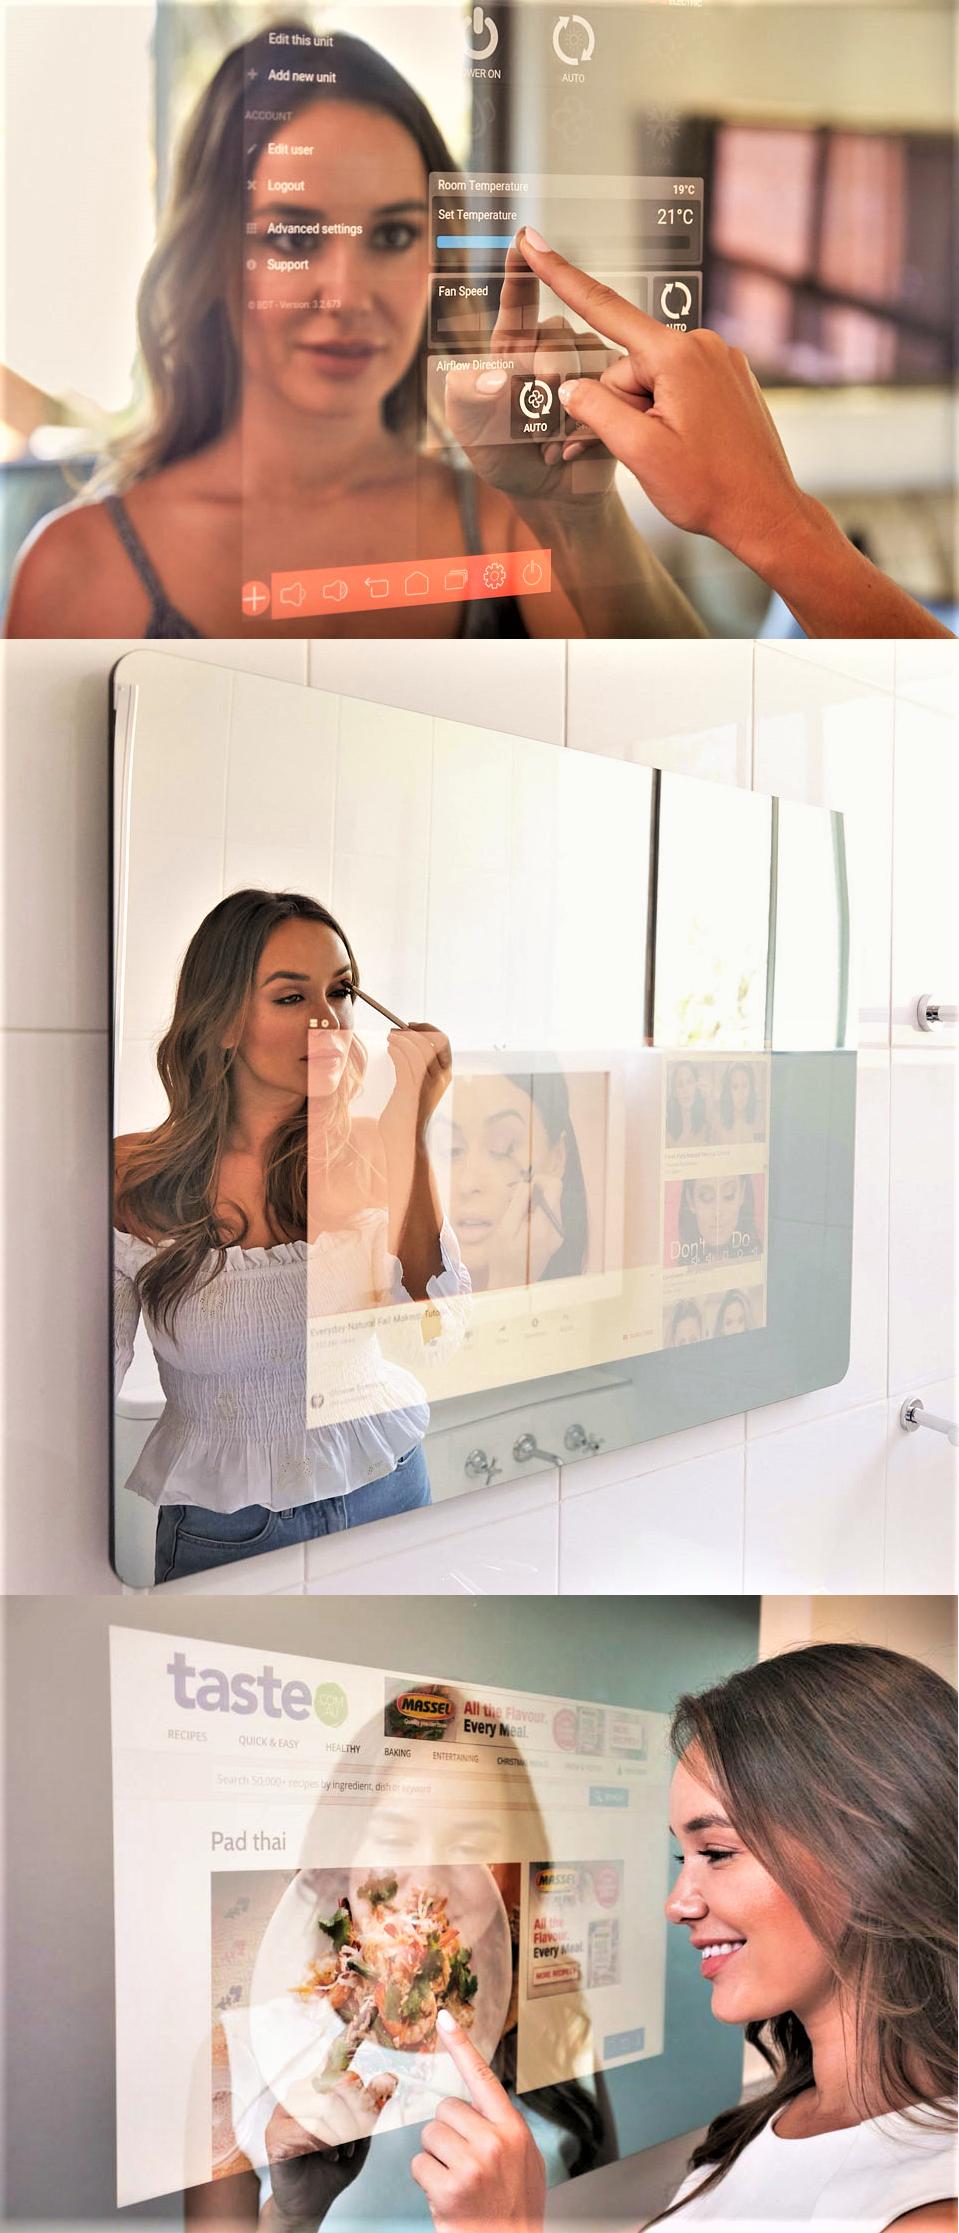 Embrace™ When it's off, it's just an elegant mirror